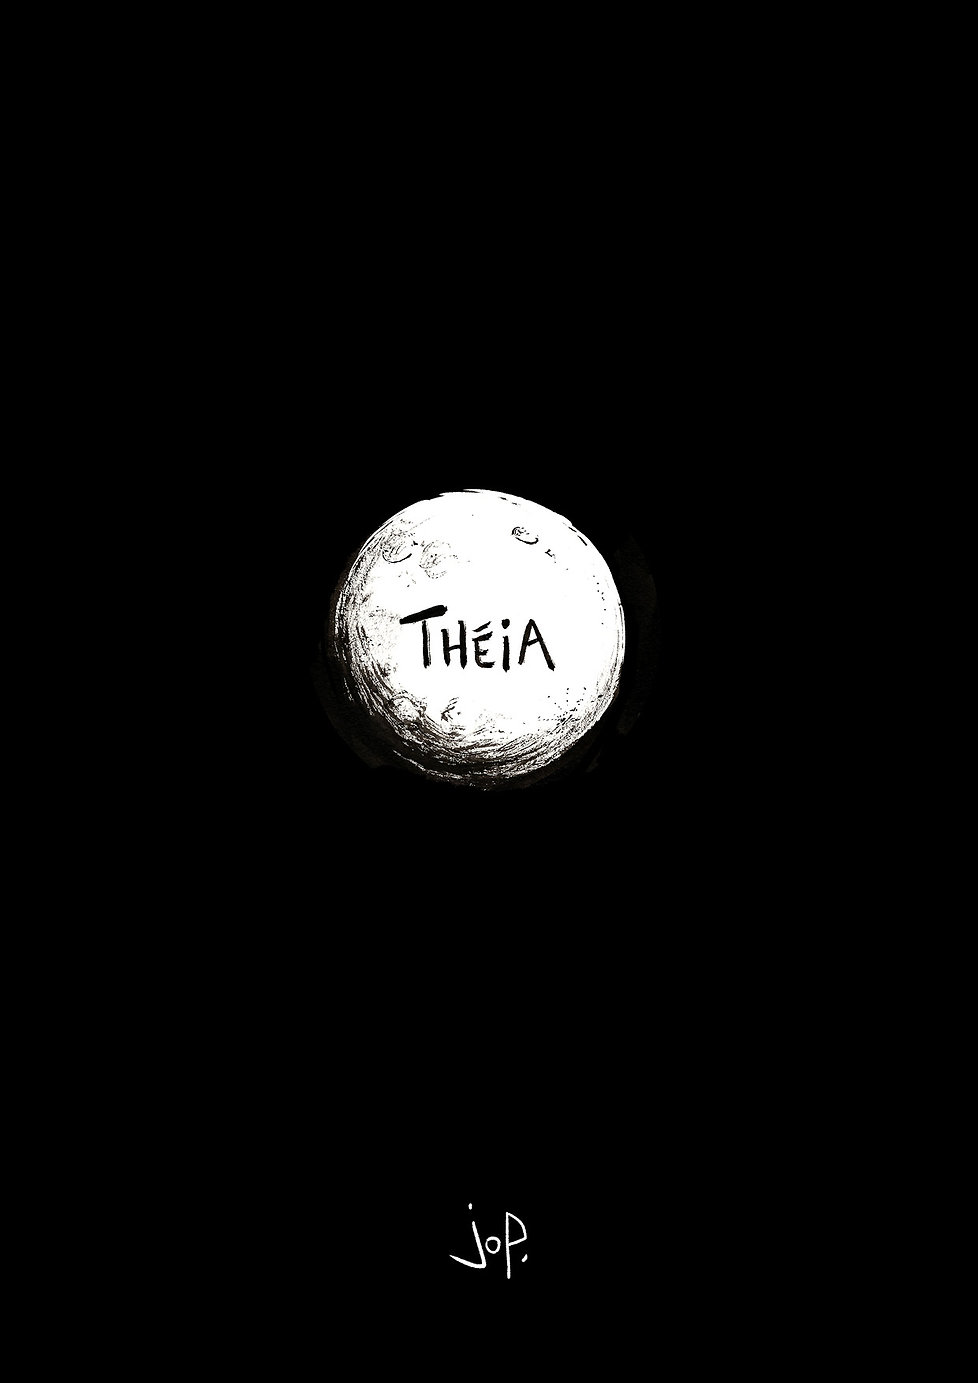 Theia-24hdelaBD.jpg